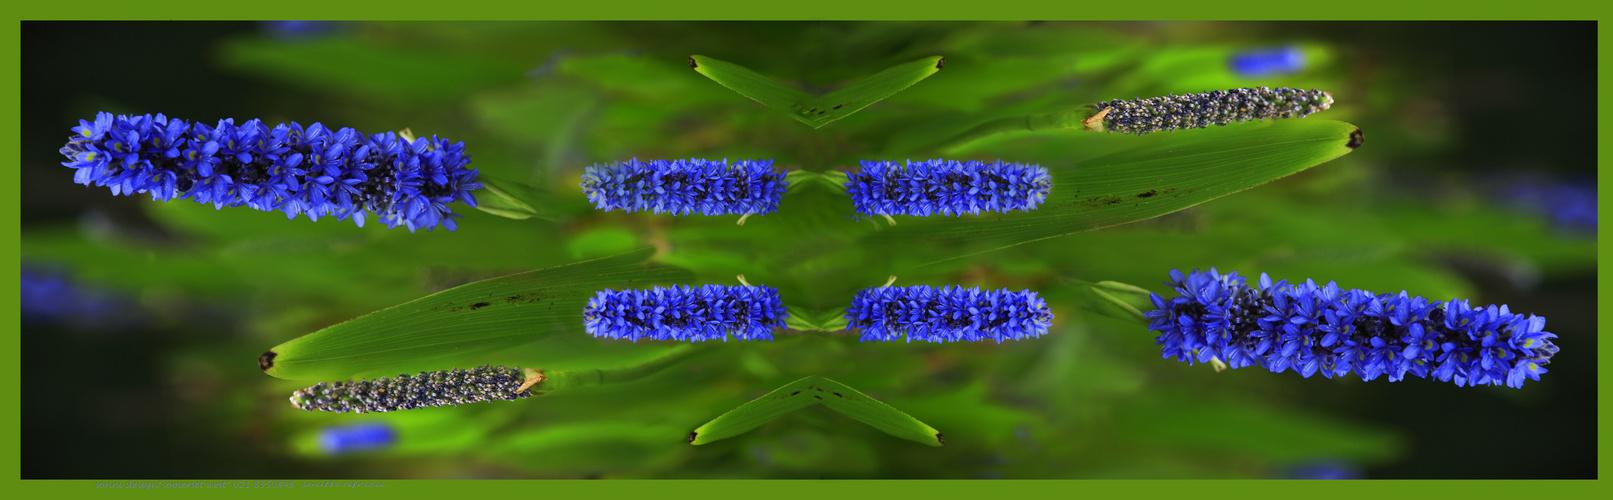 Blaue Kerze Blüte